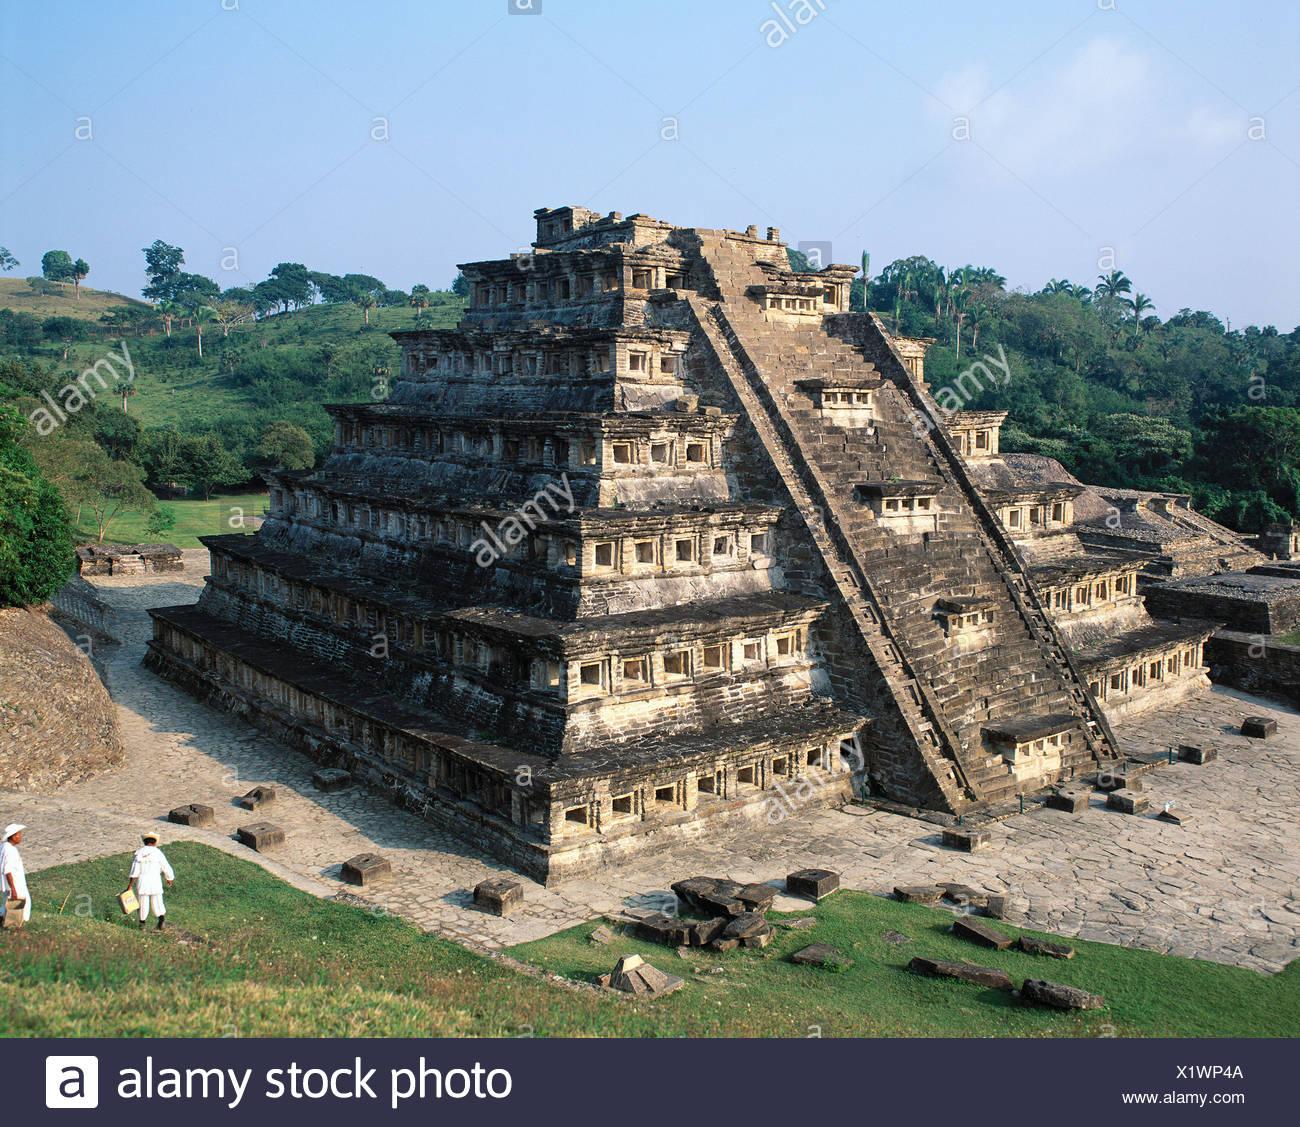 El Tajin culture Mexico Central America Latin America niches pyramid pyramid state Veracruz stair - Stock Image